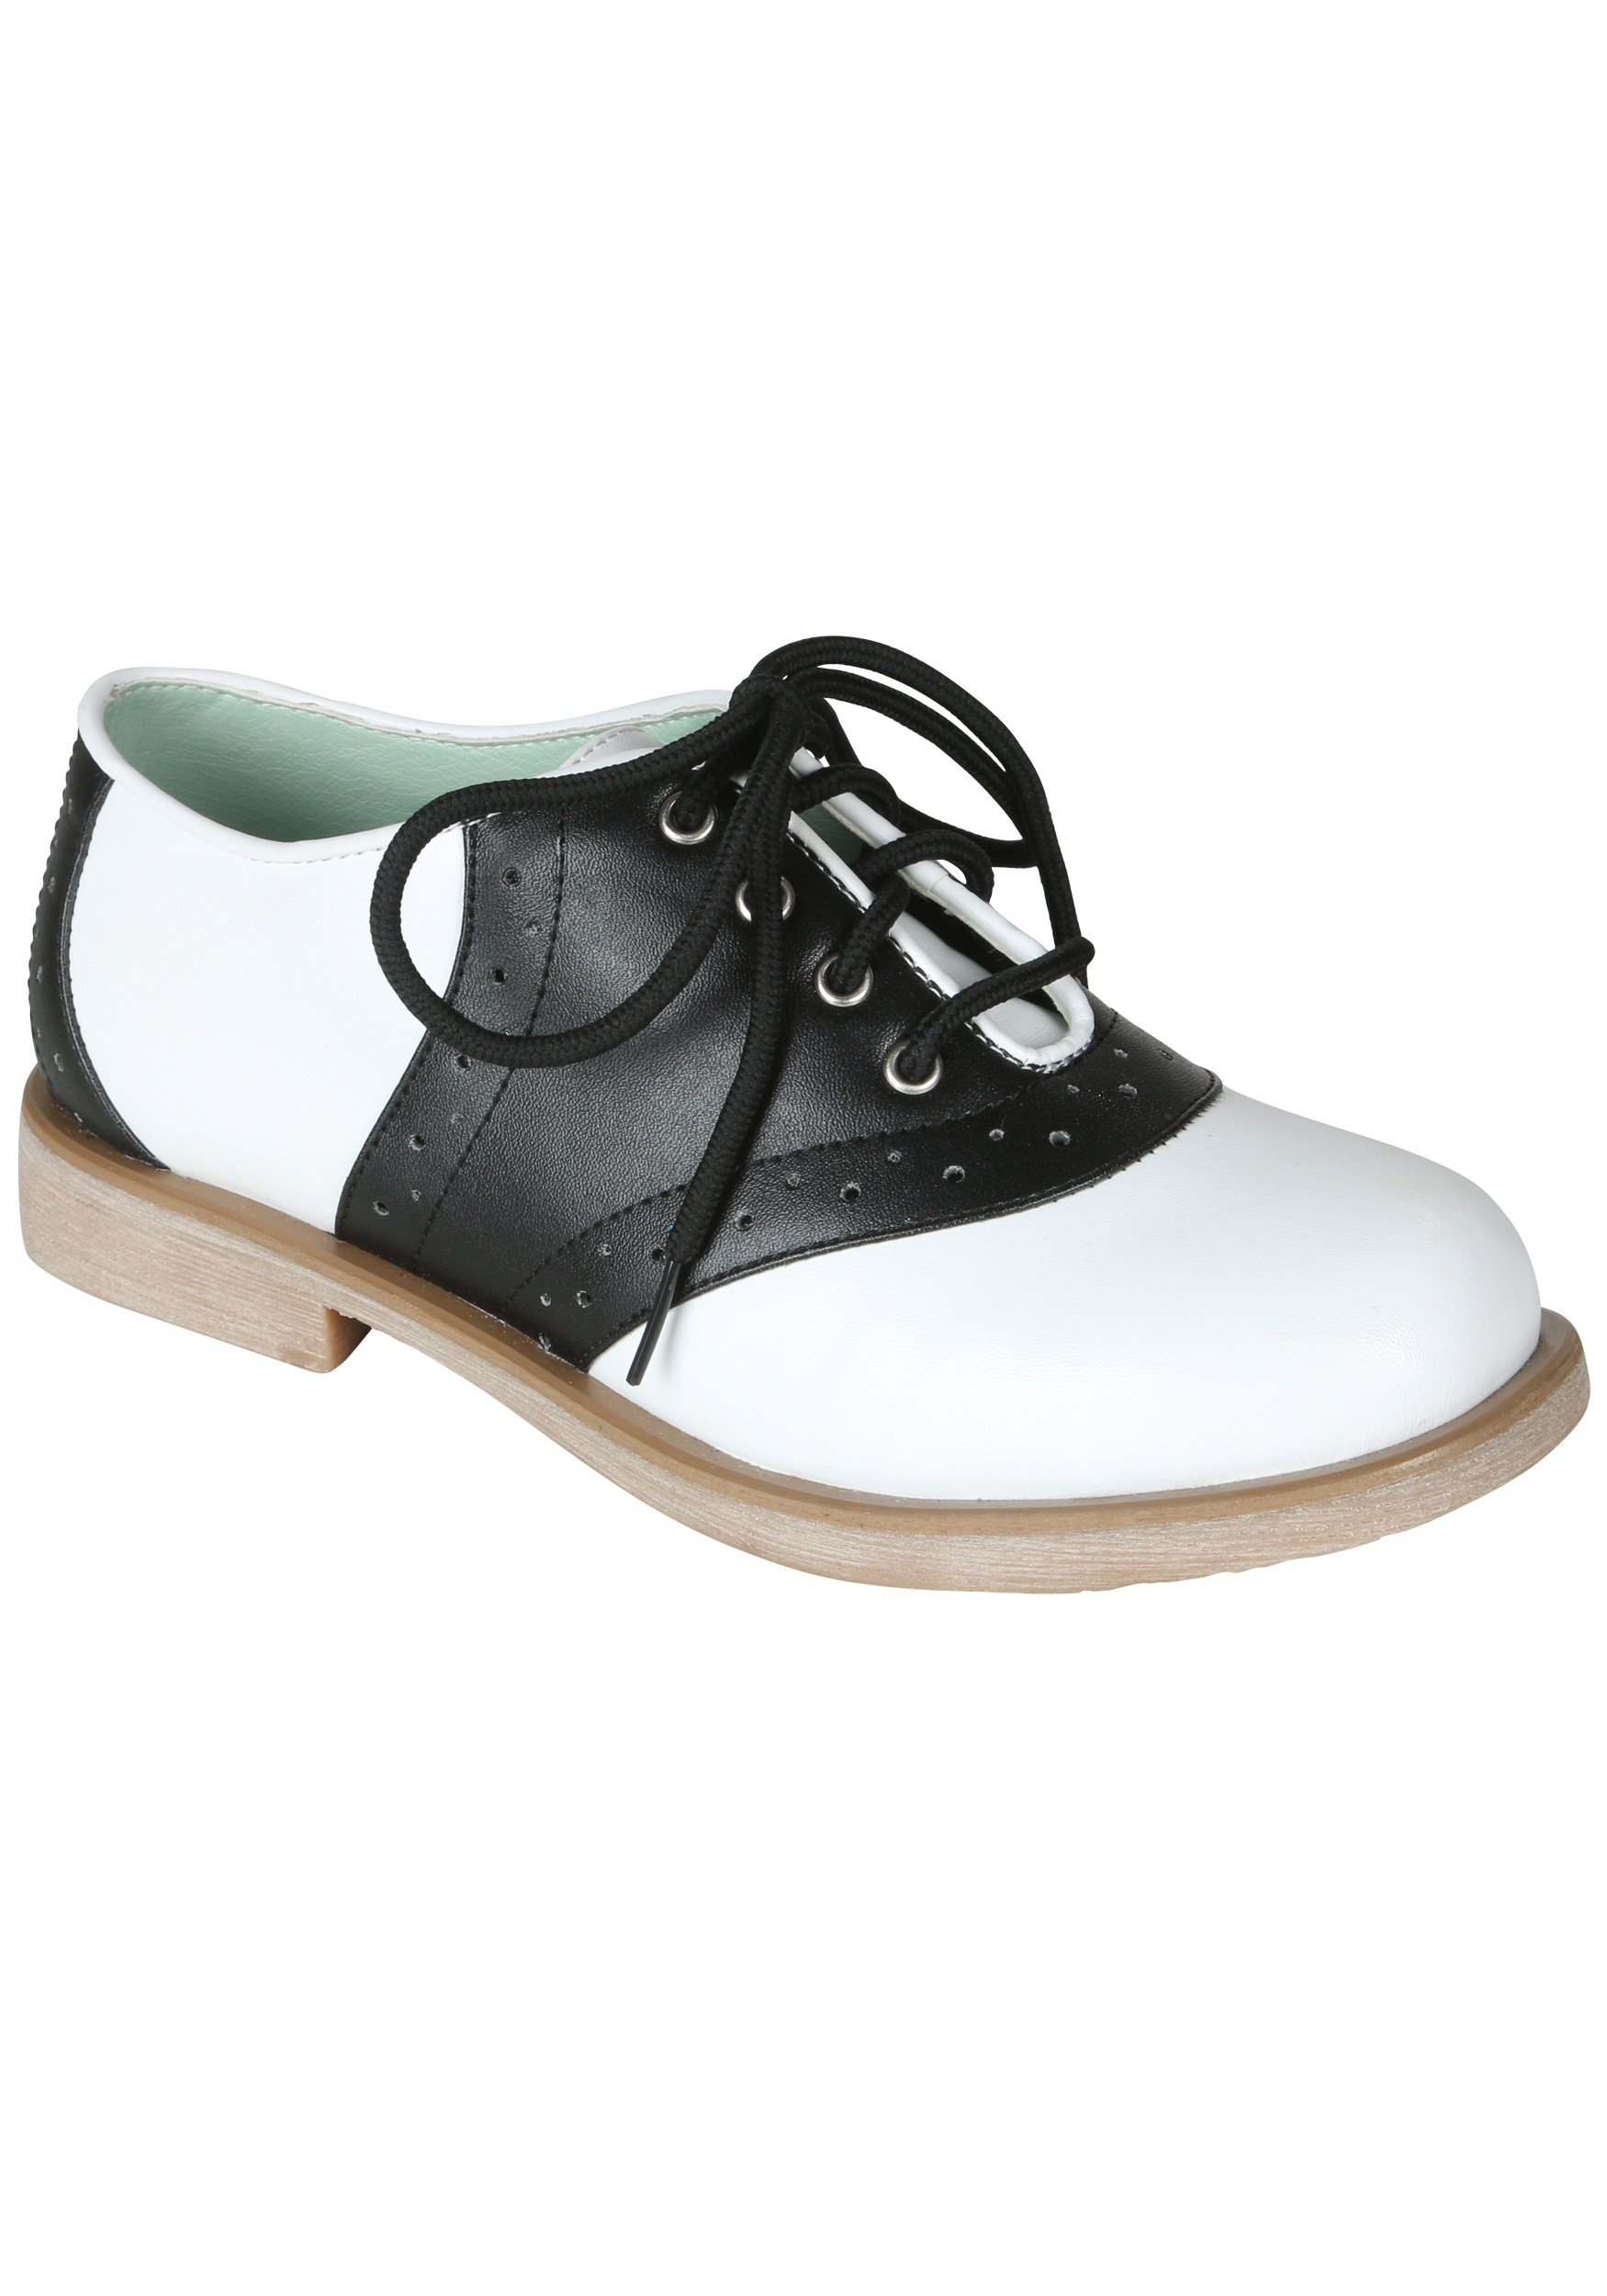 kids-saddle-shoes.jpg 1eee1ed77d